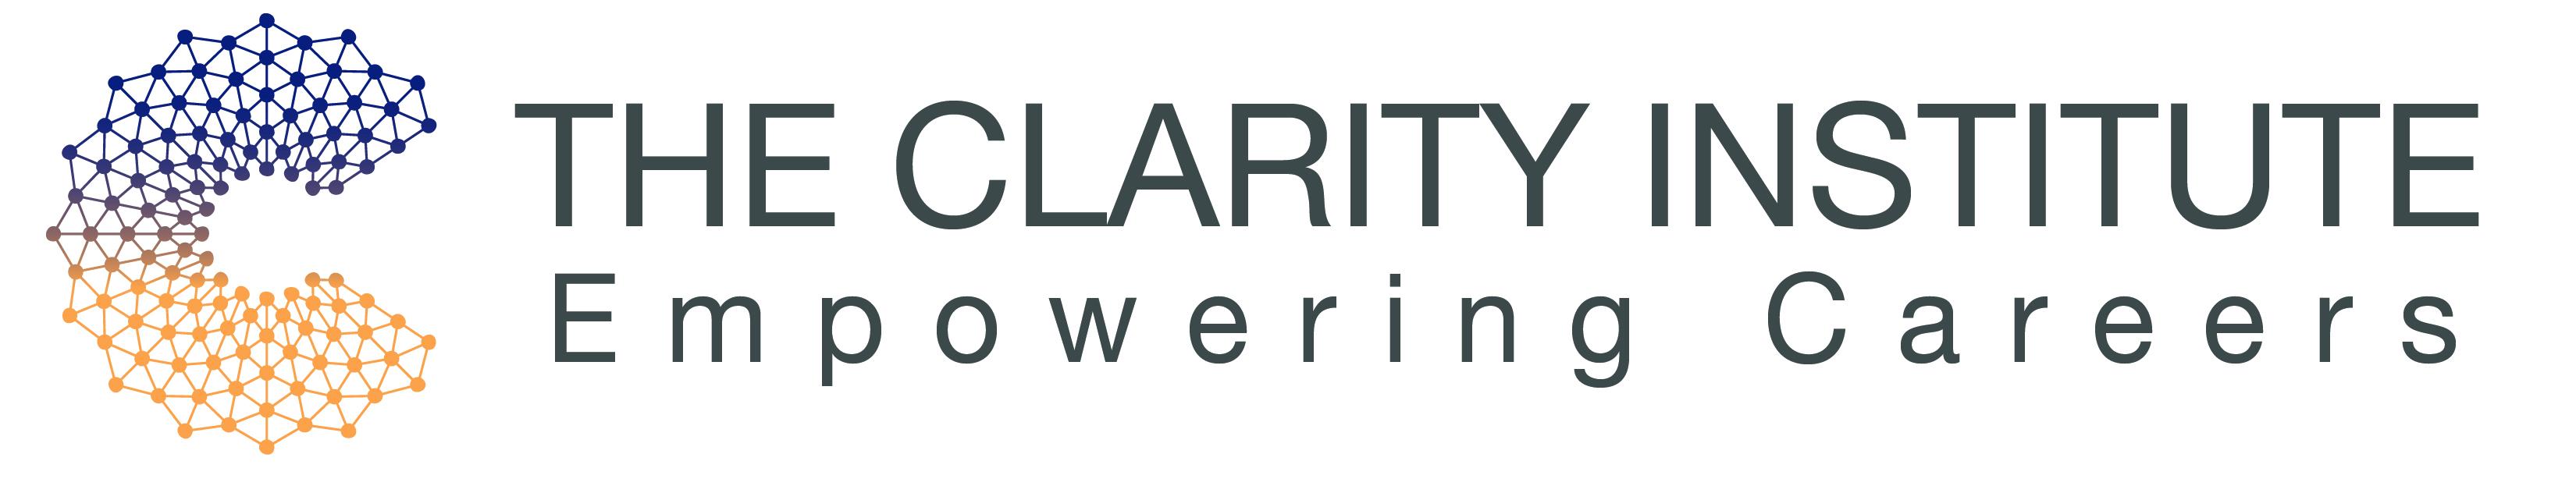 LogoClarityInstitute